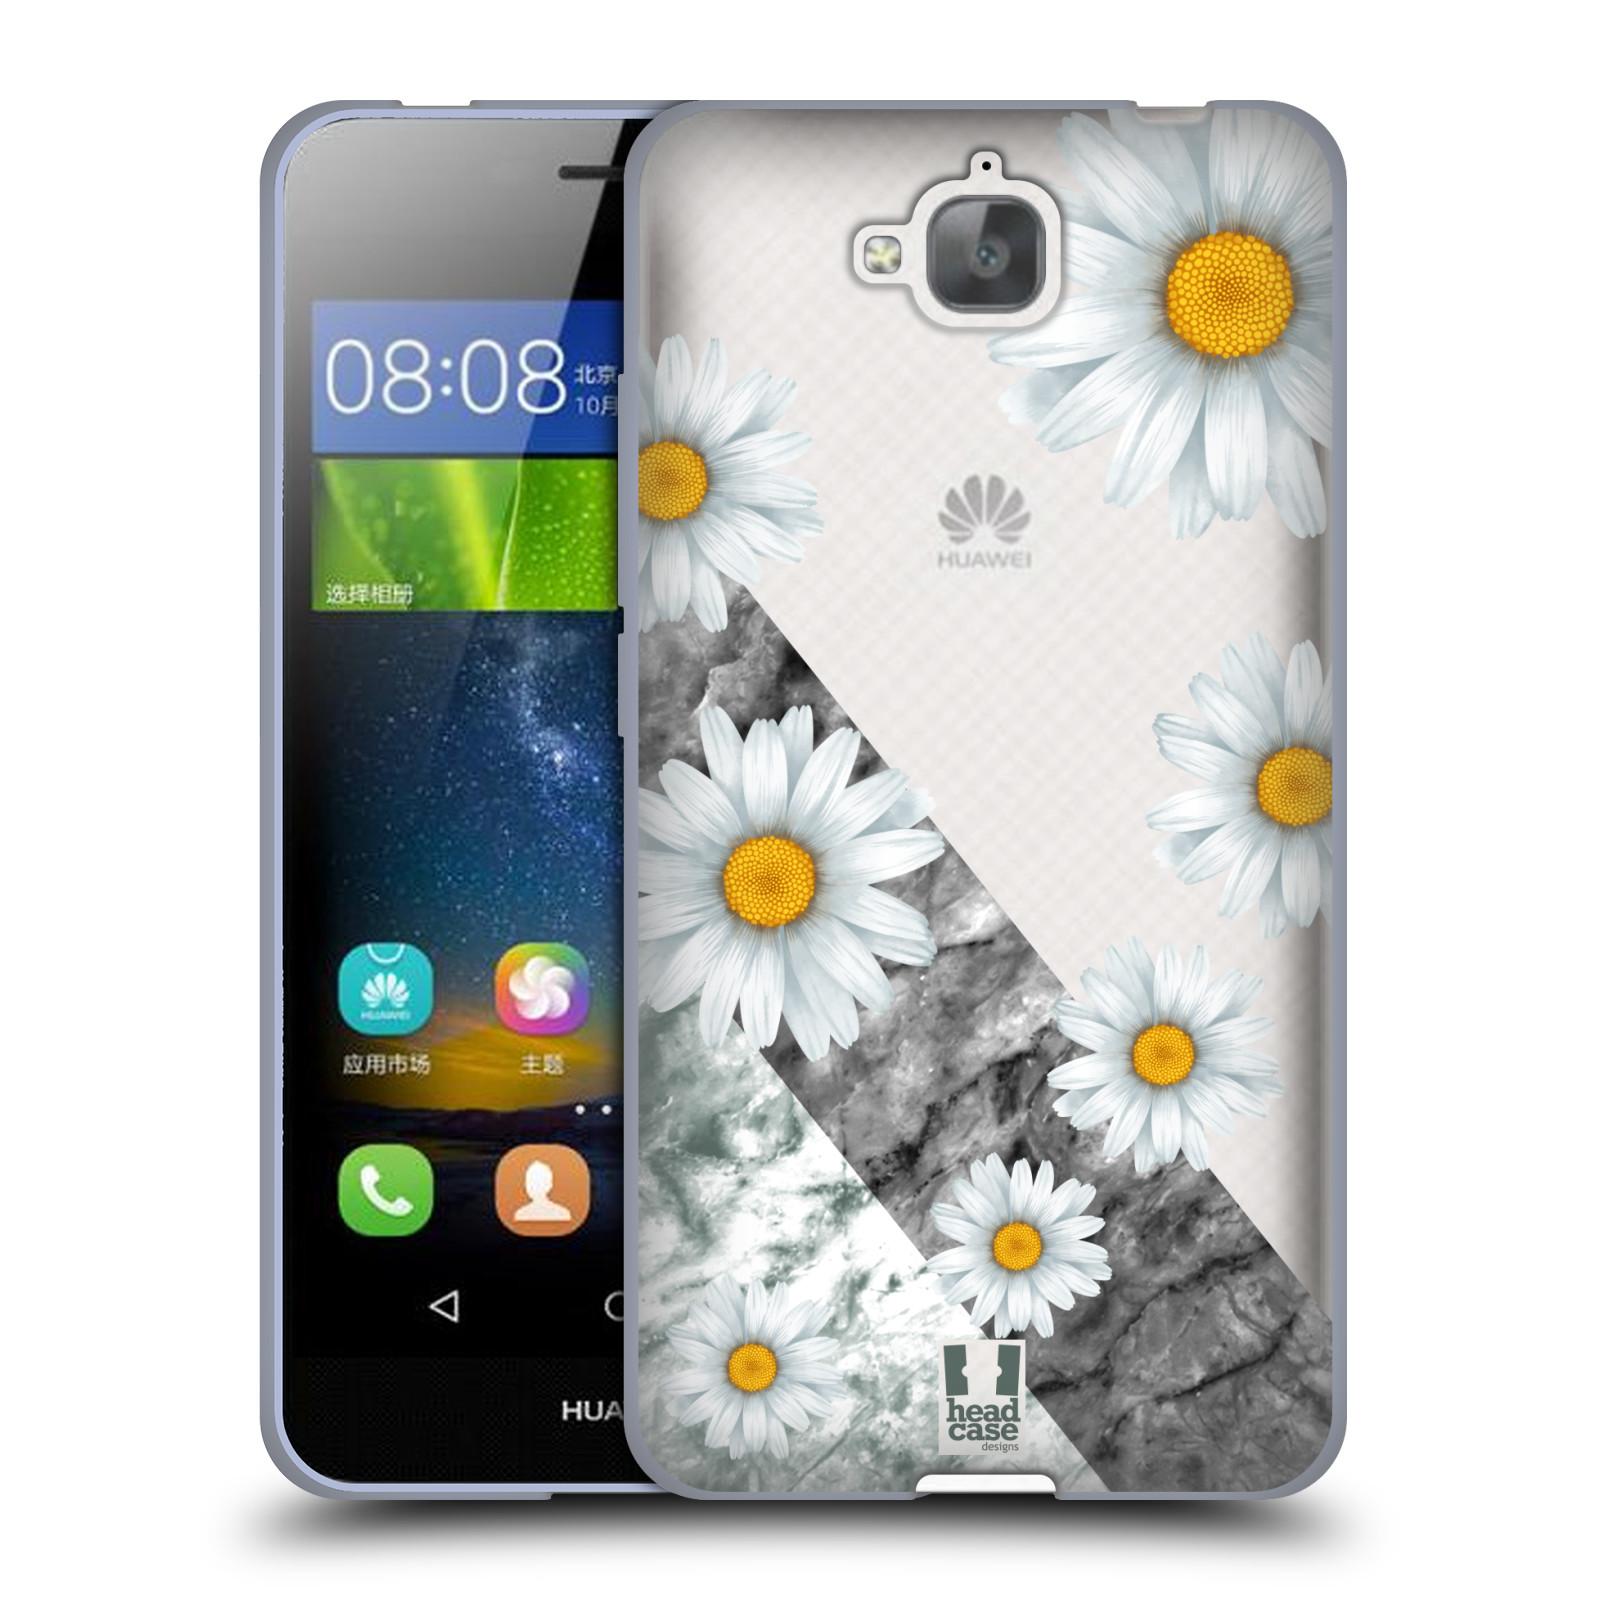 Silikonové pouzdro na mobil Huawei Y6 Pro Dual Sim - Head Case - Kopretiny a mramor